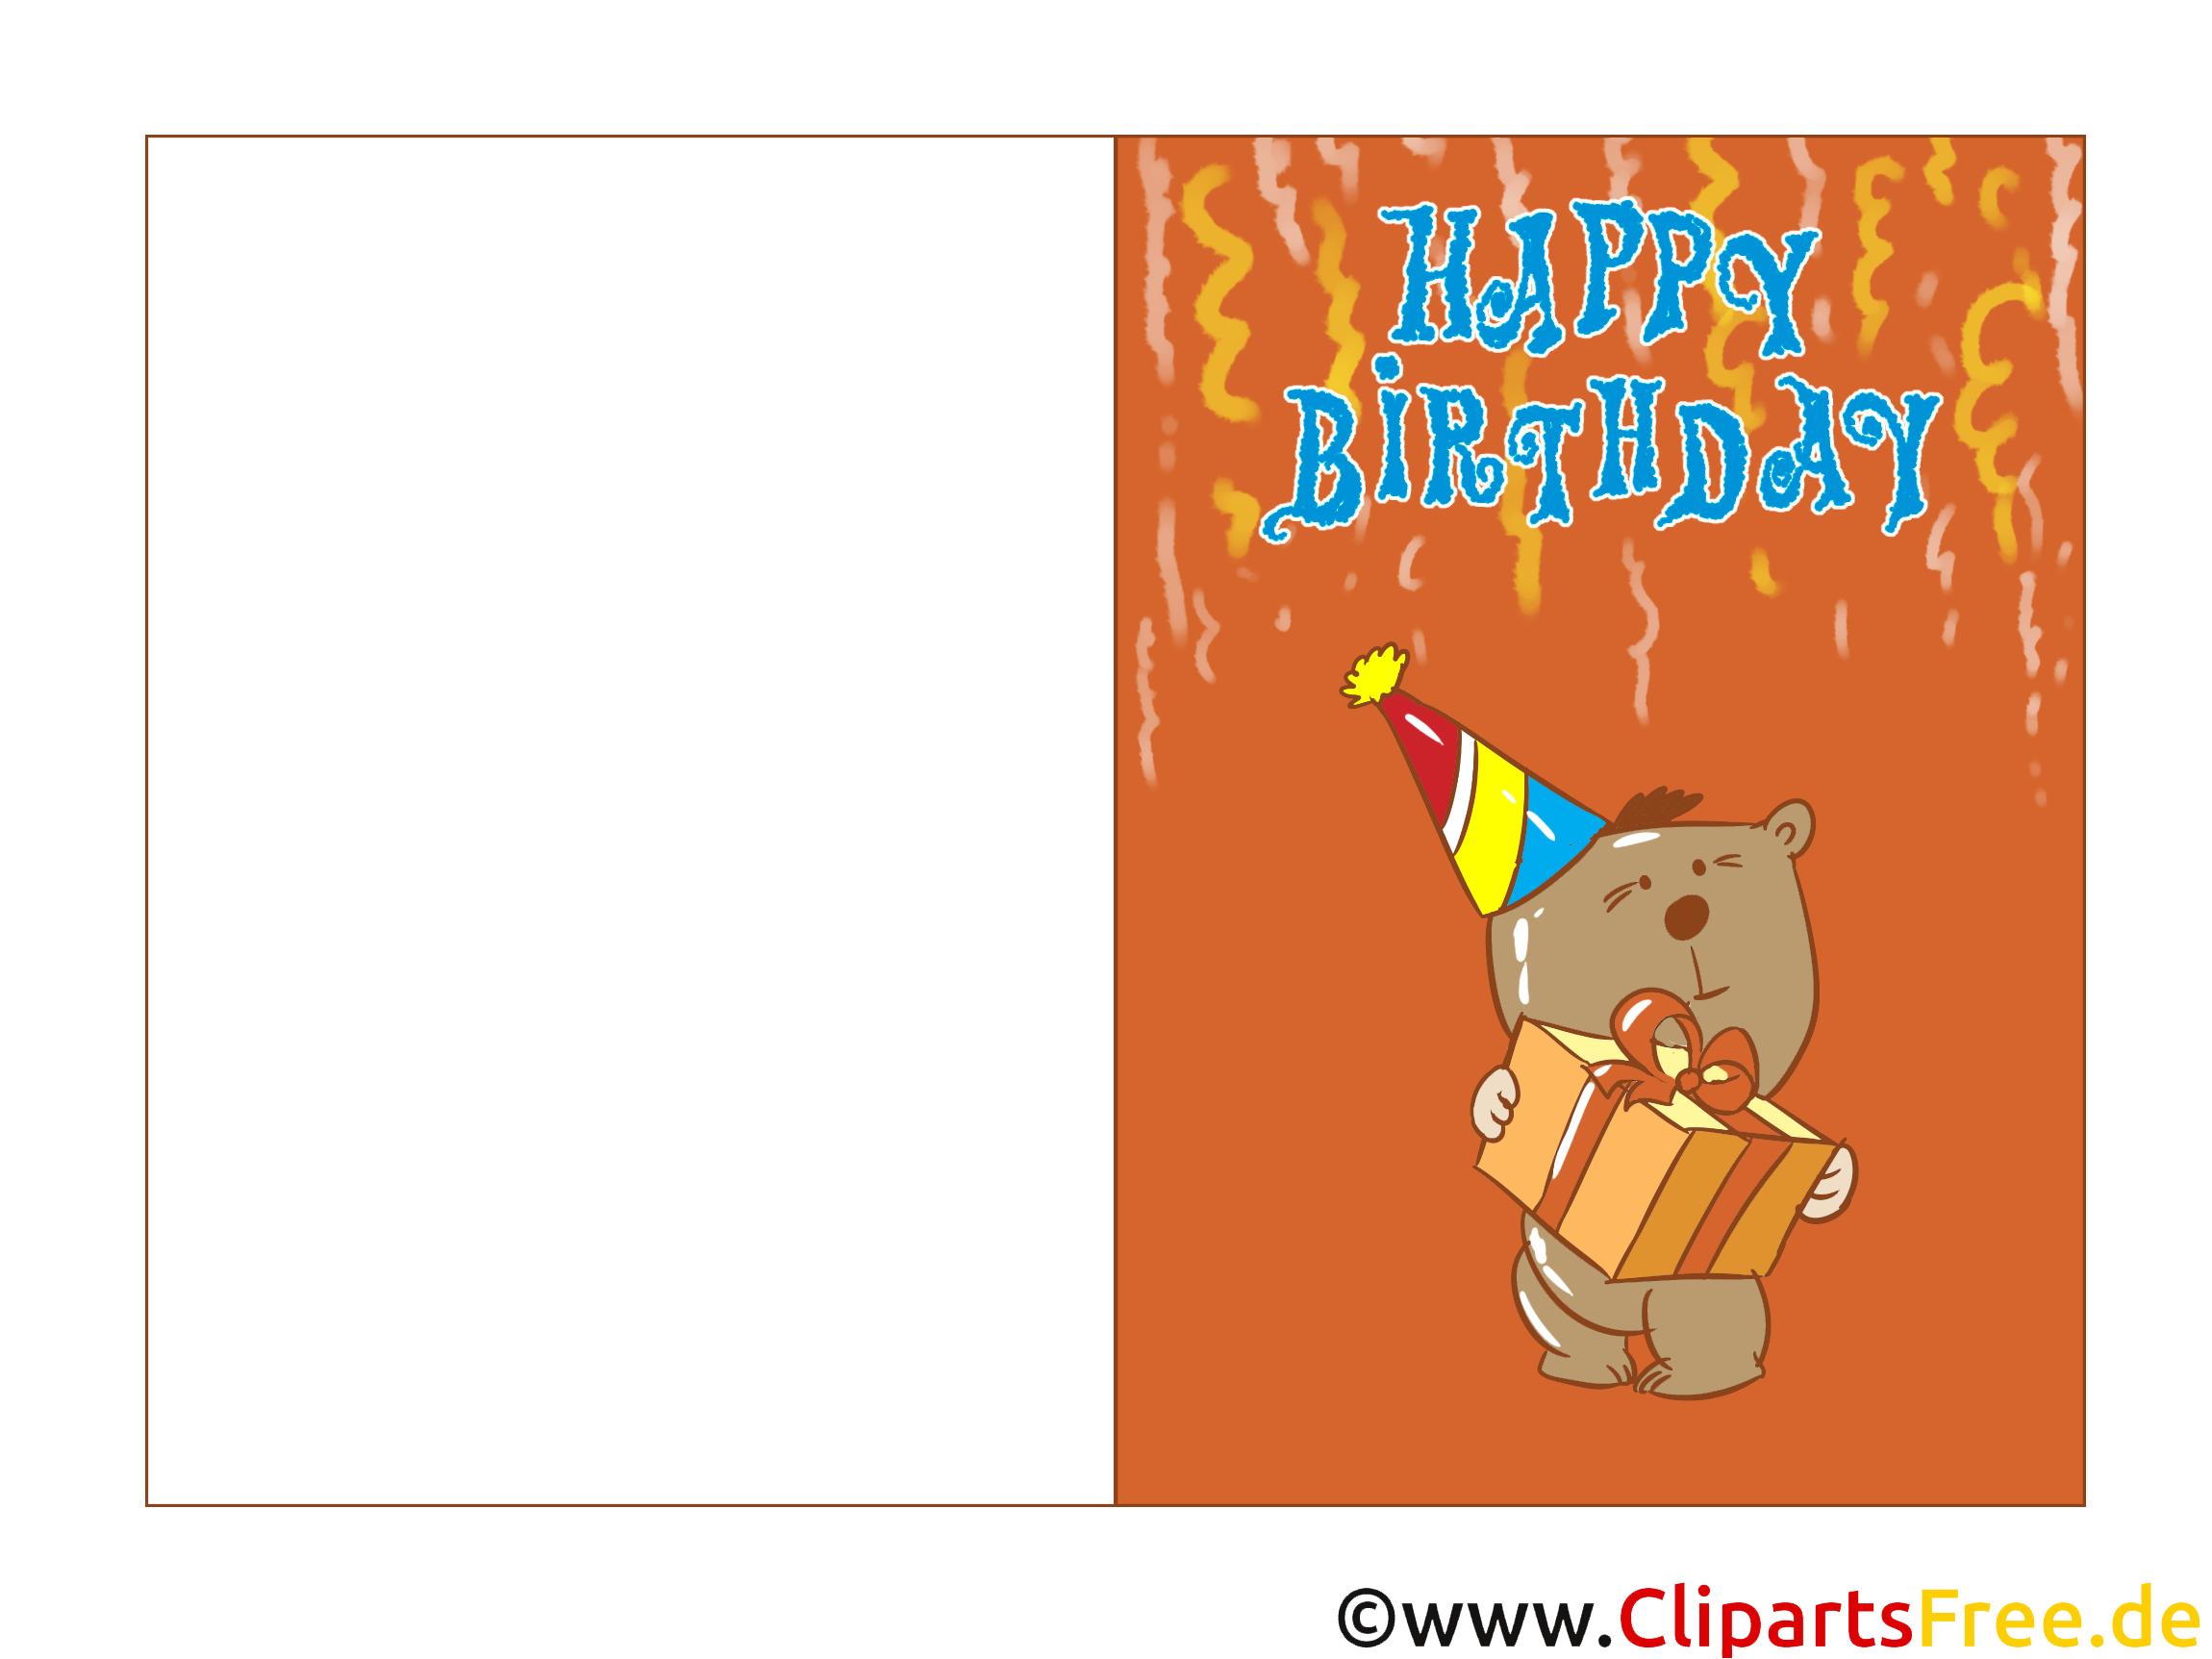 Funny Birthday Greetings Free